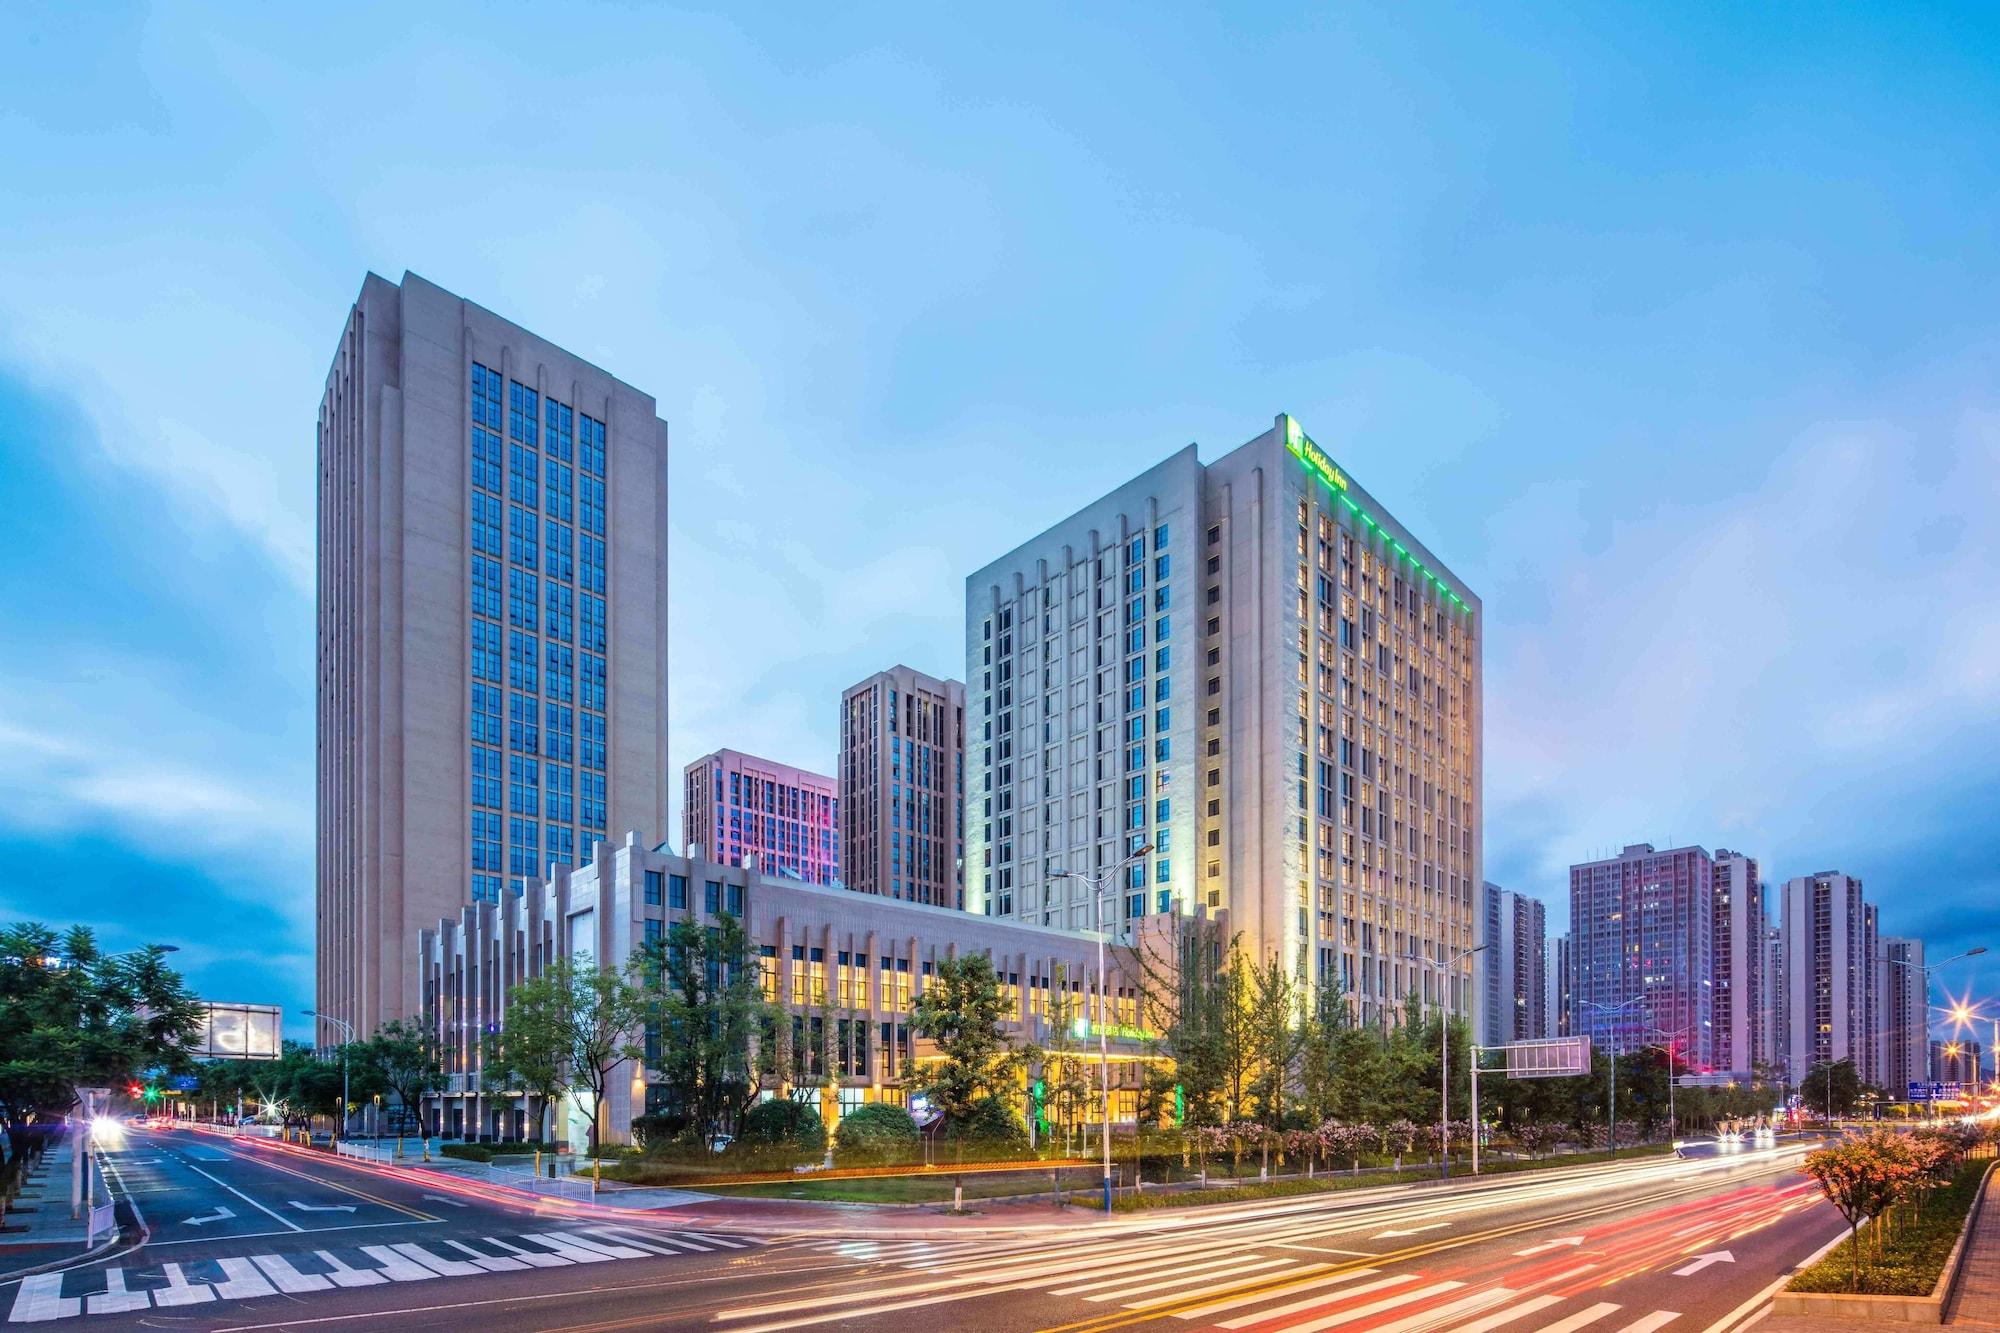 Holiday Inn Chongqing University Town, Chongqing